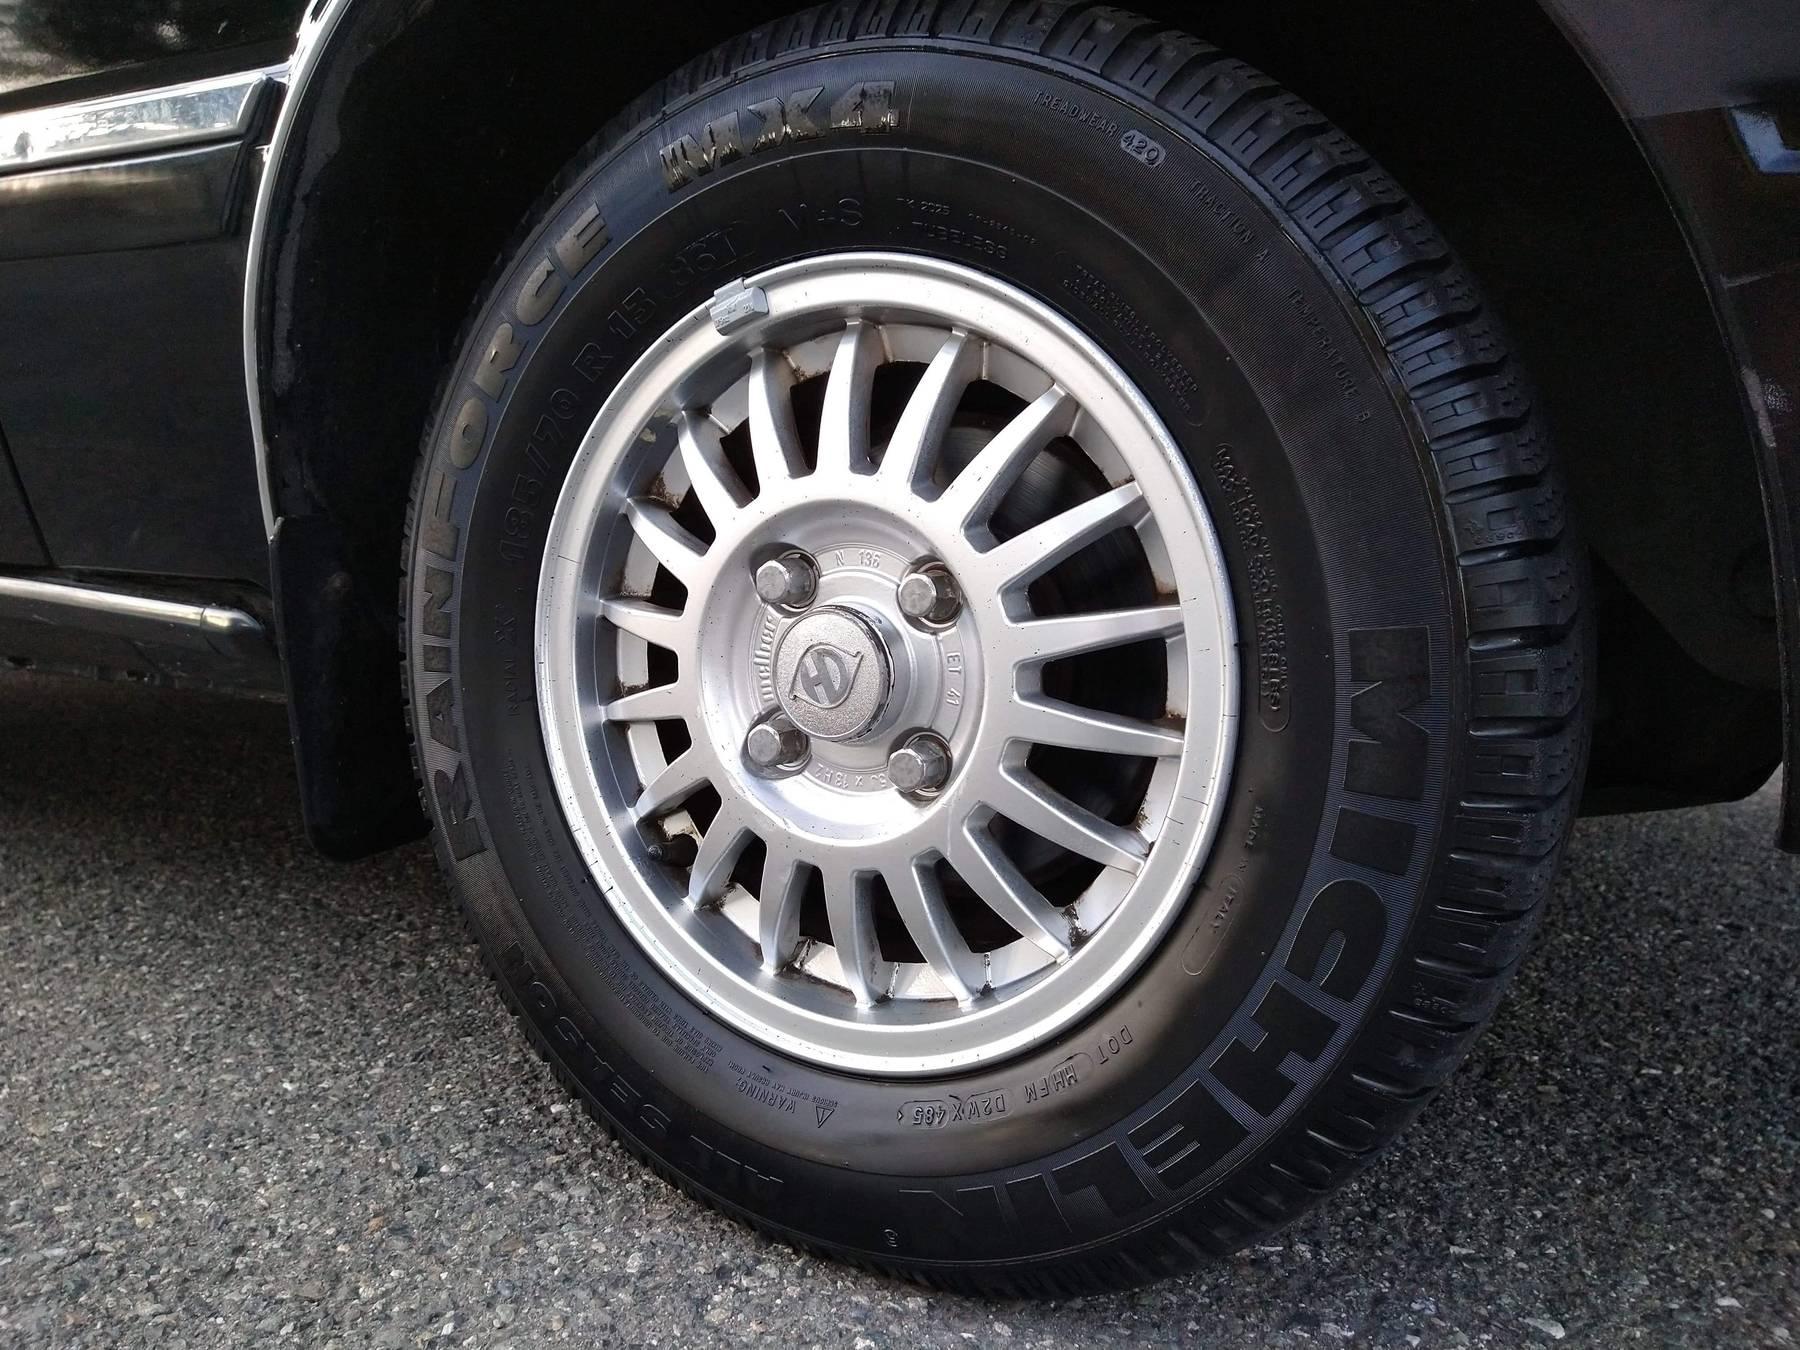 1986 Hyundai Stellar Executive wheel and tire